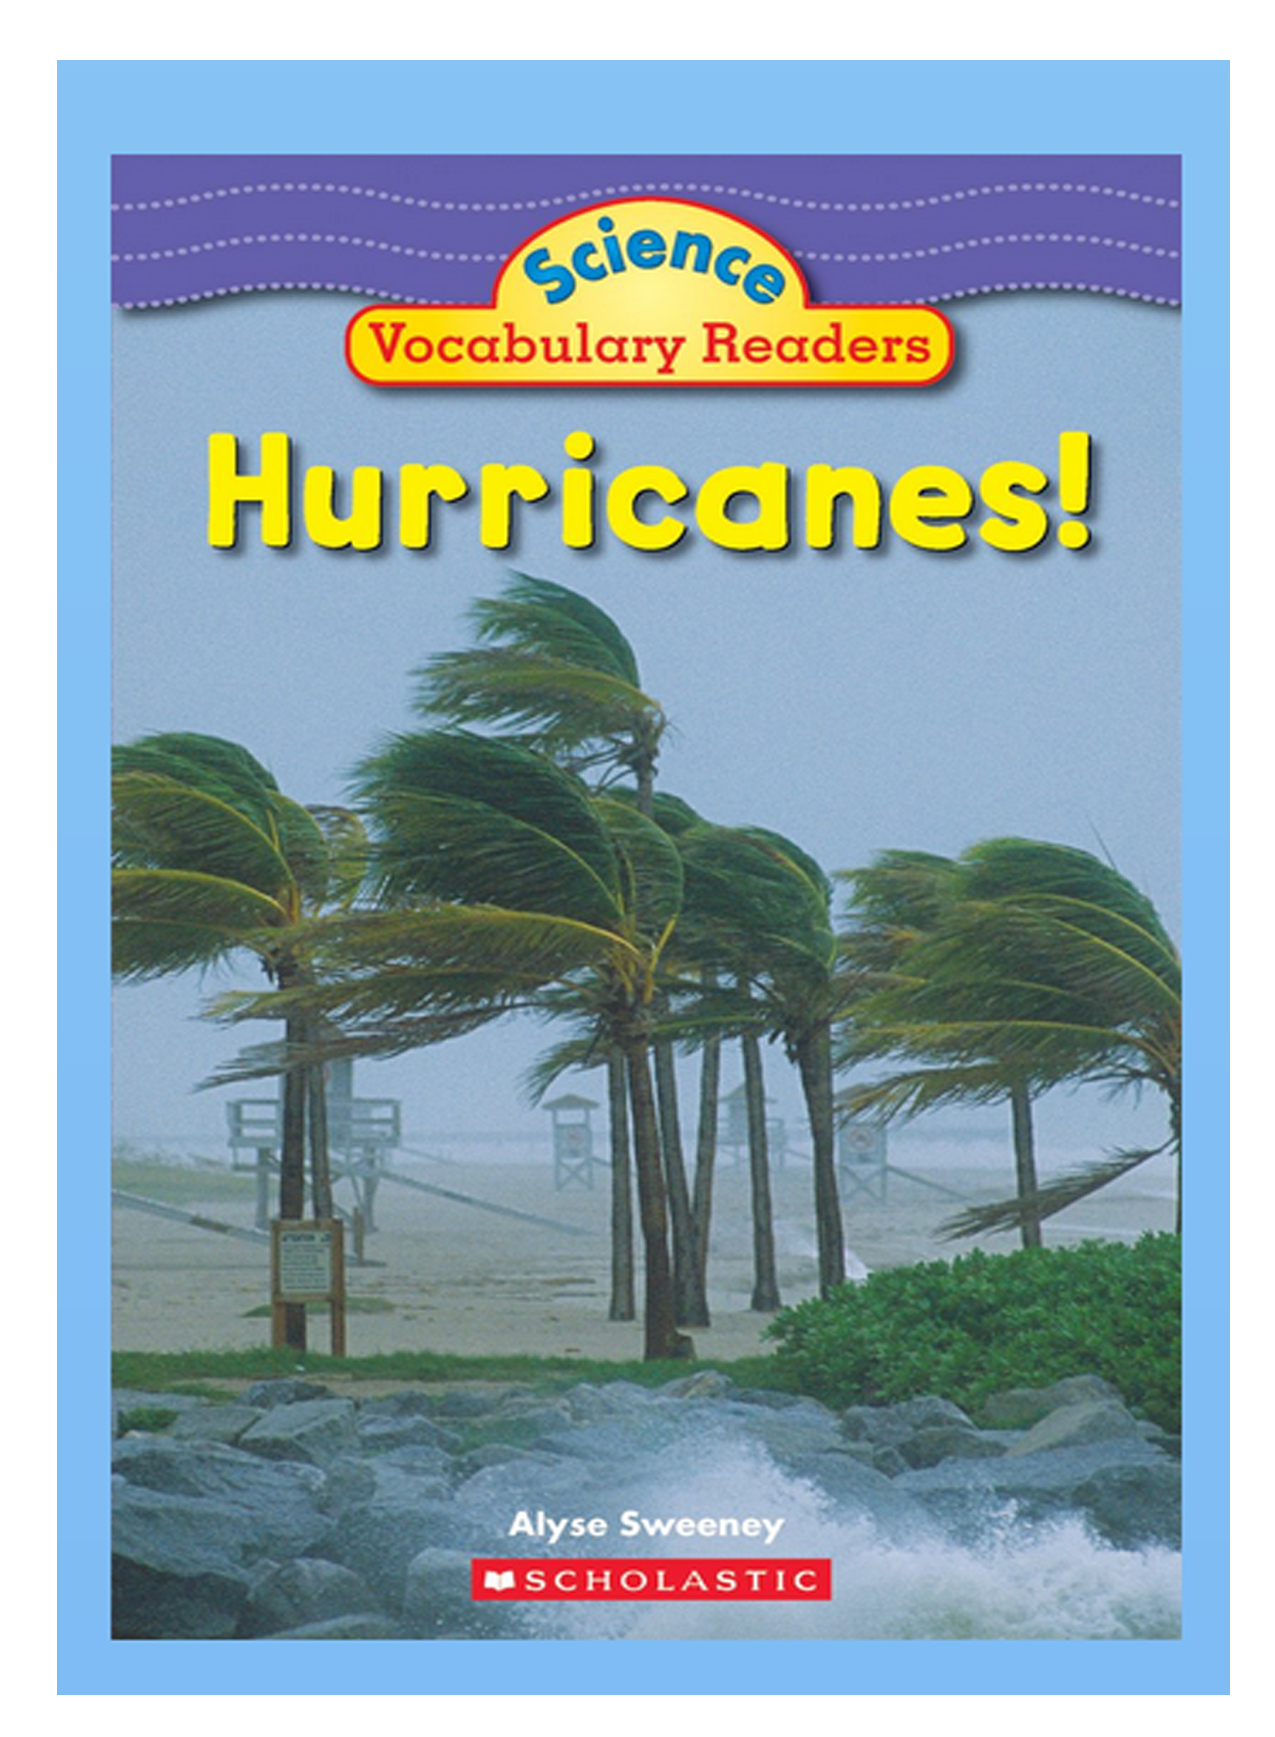 hurricanes copy.jpg